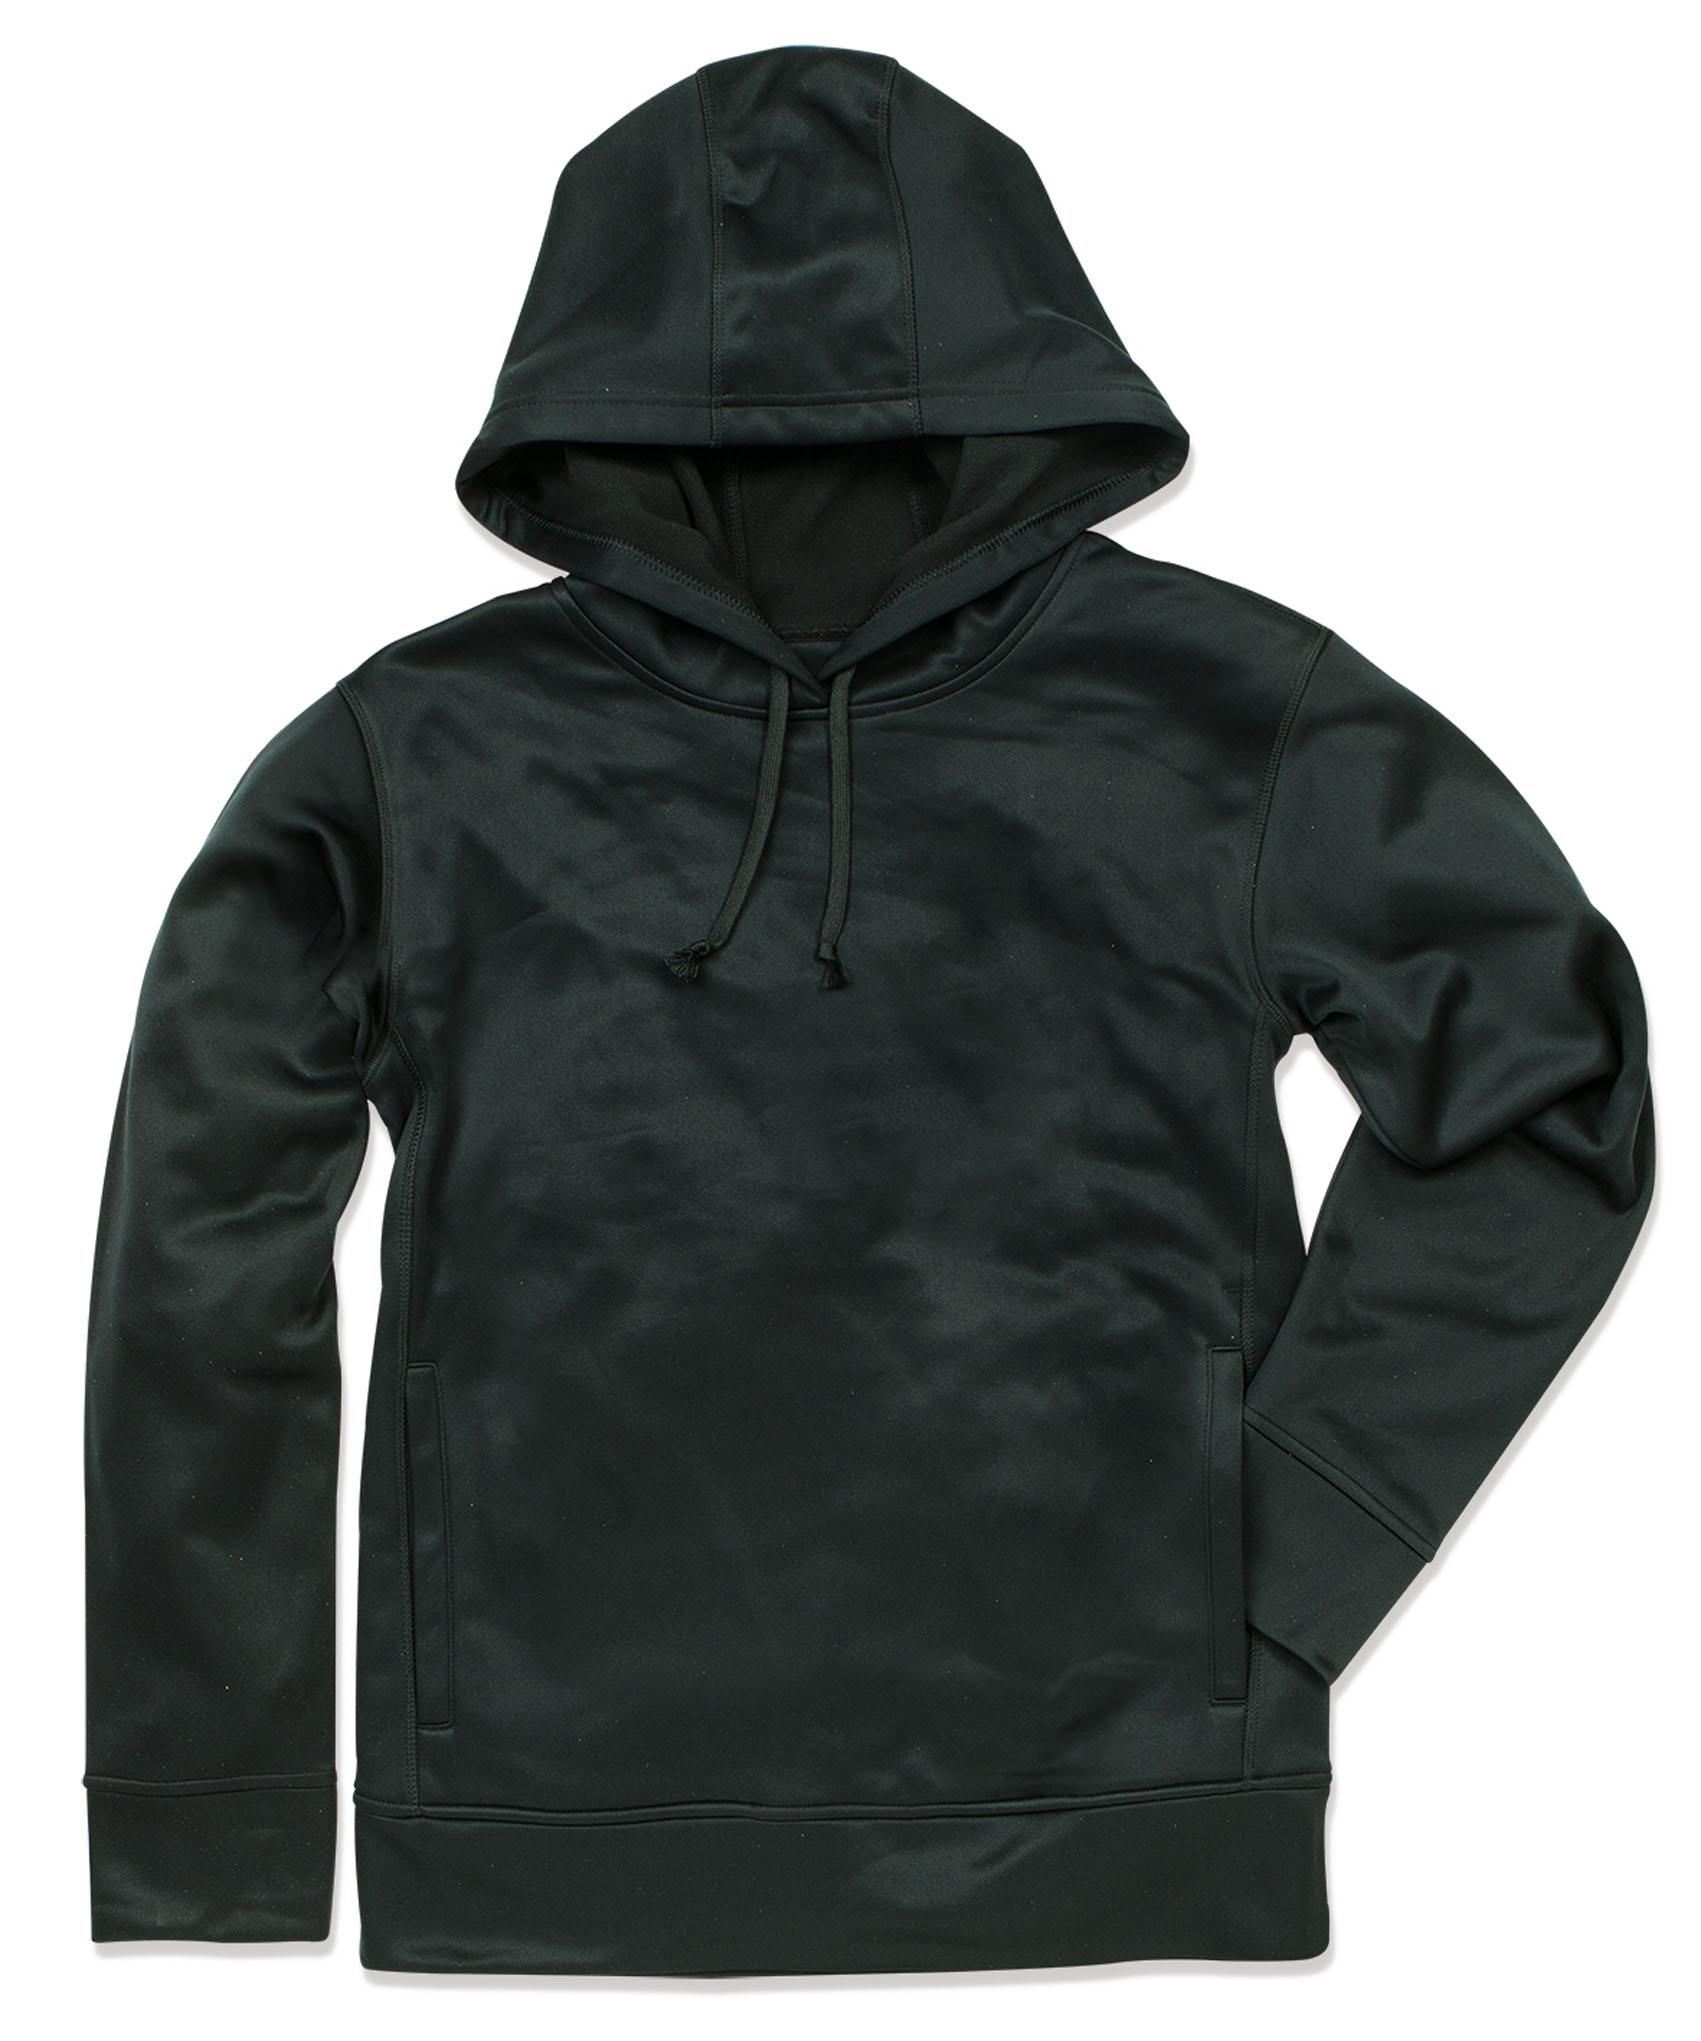 Stedman Sweater Hooded Active Bonded